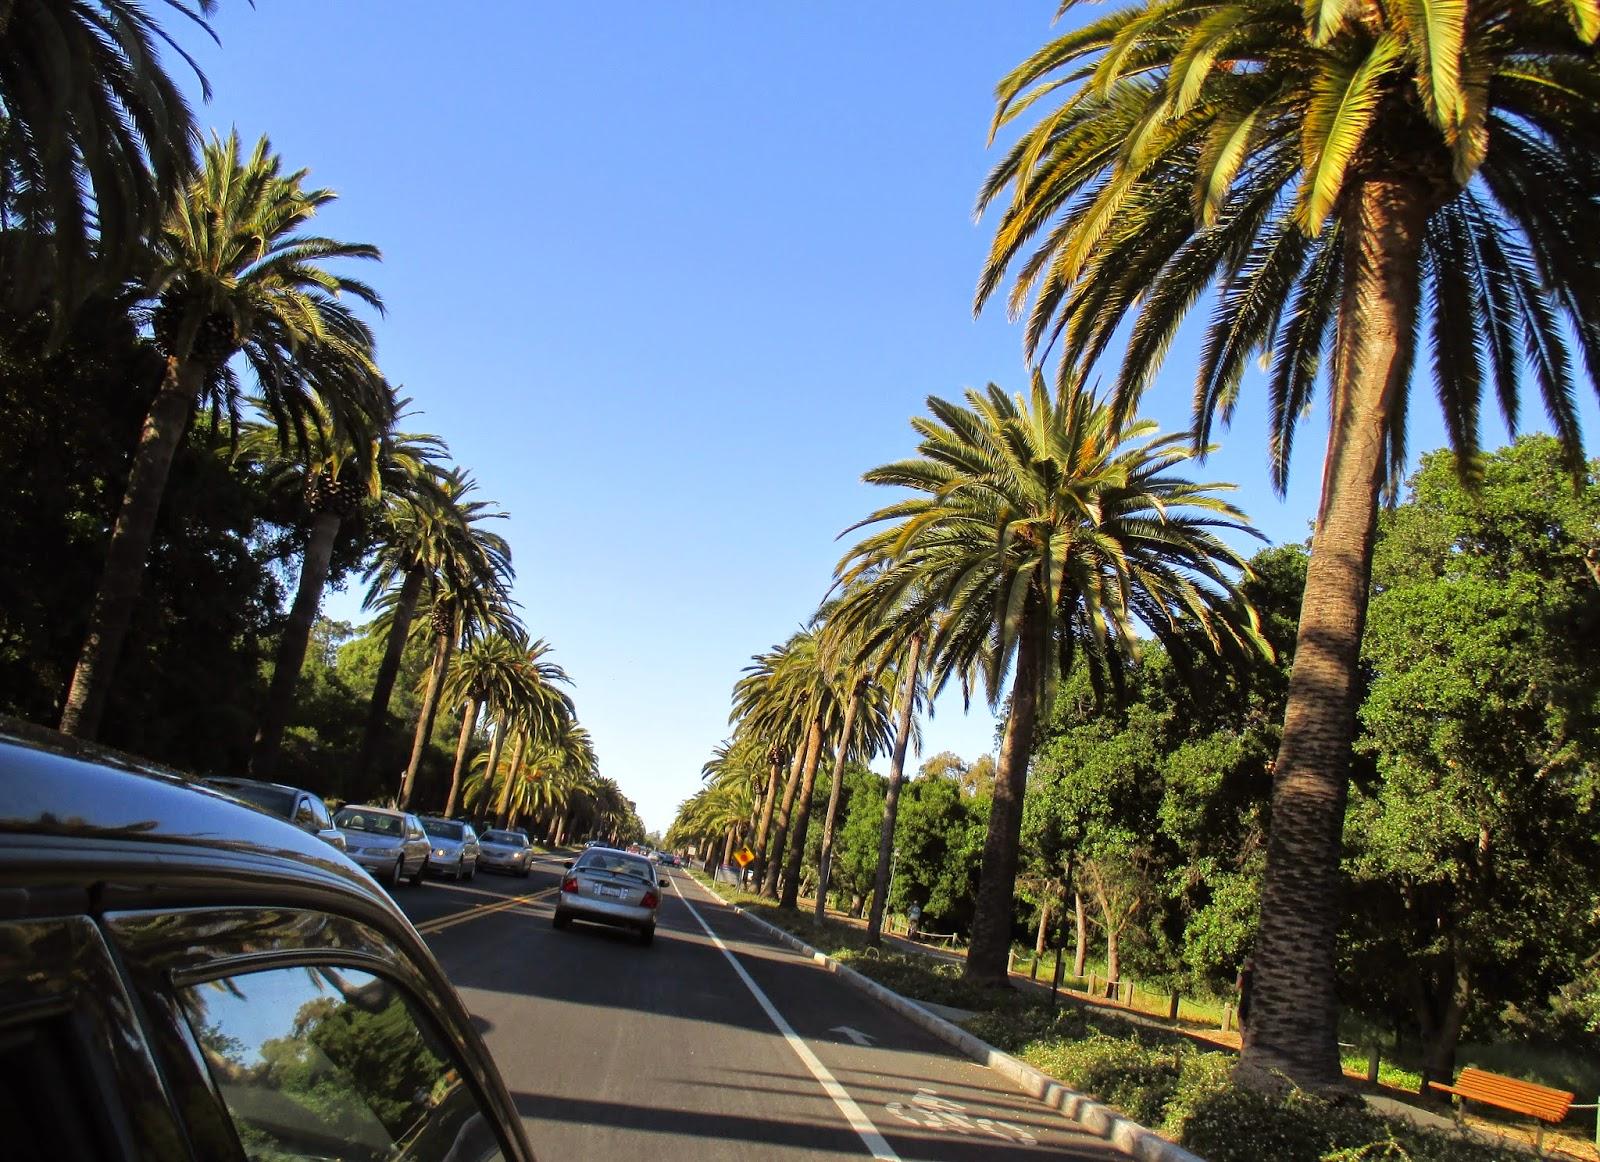 Stanford University Palm Drive